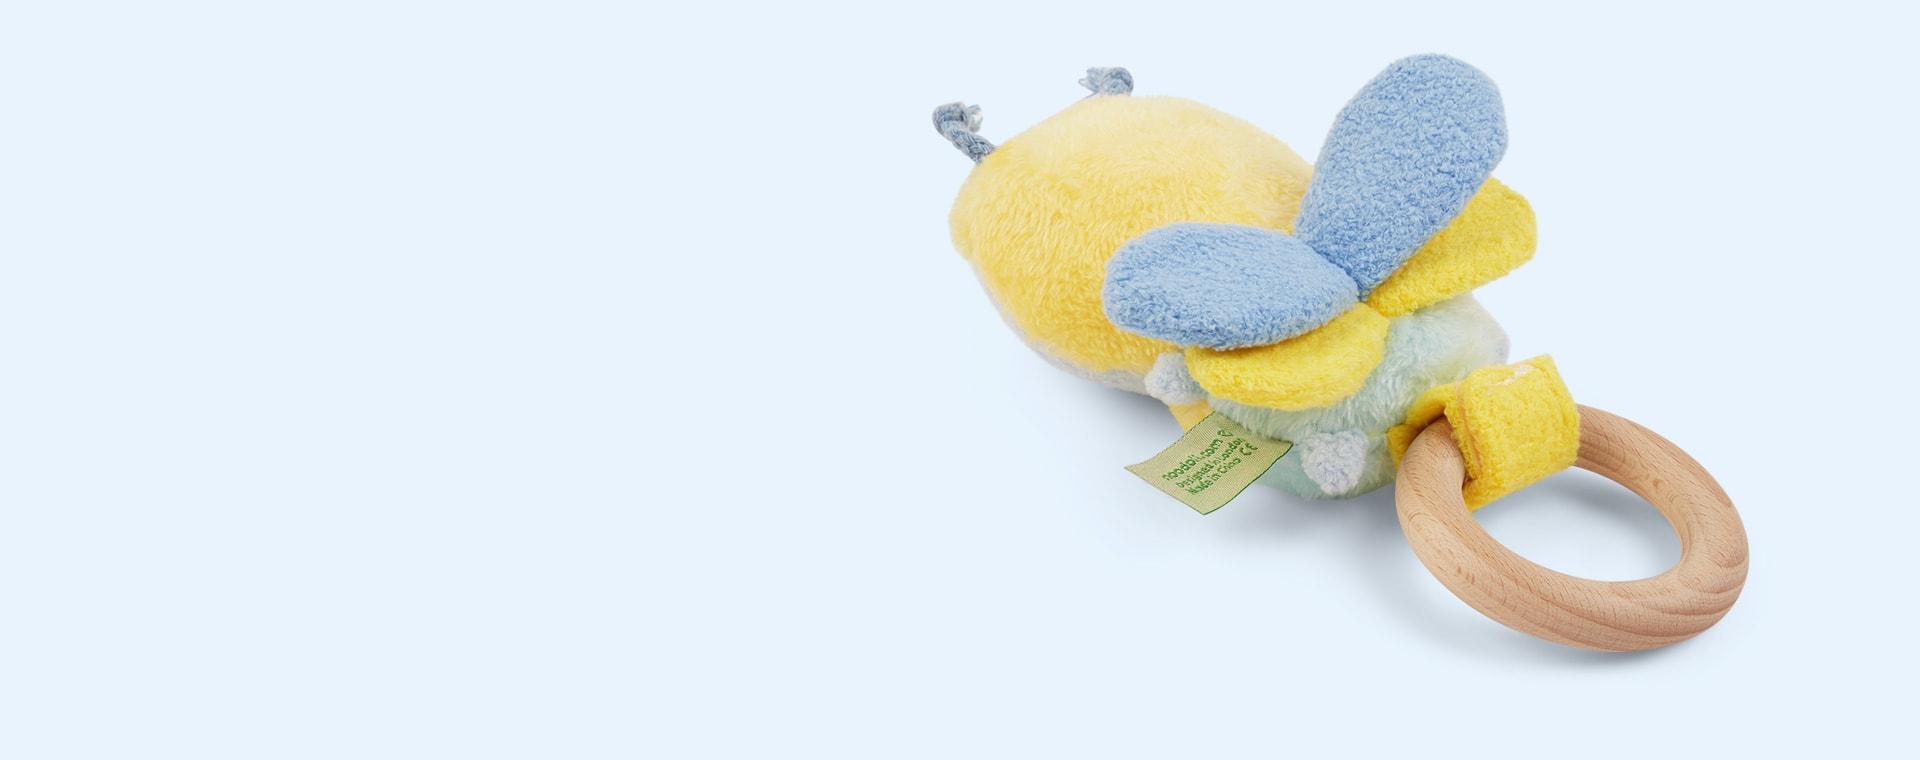 Yellow Noodoll Ricebee Rattle